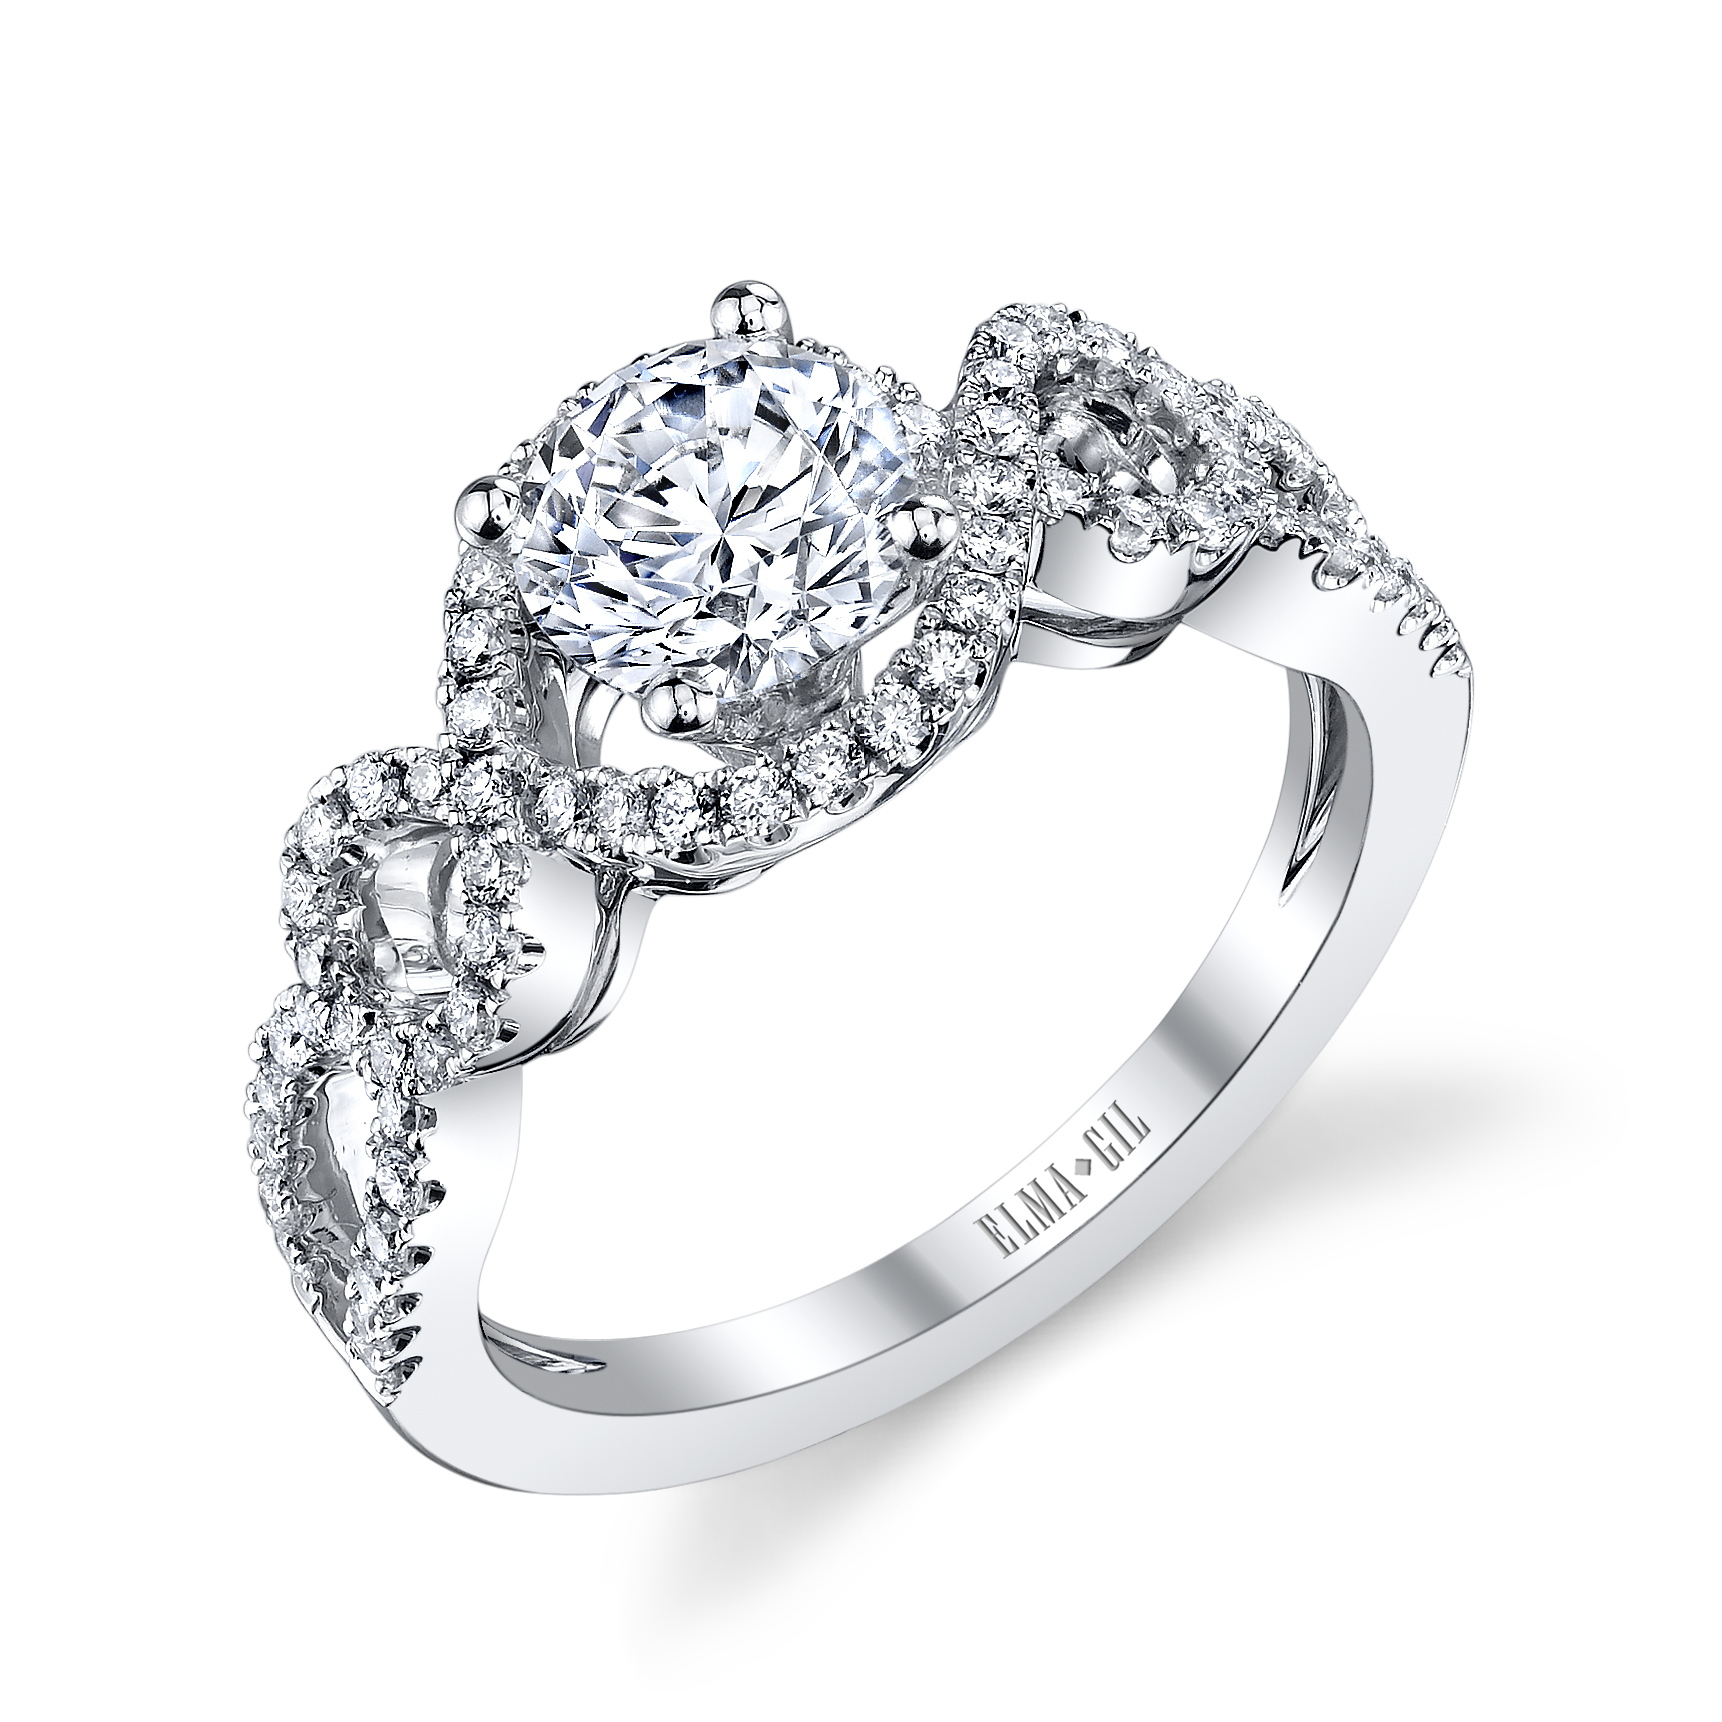 Amazing Most Beautiful Wedding Rings In the World Wedding